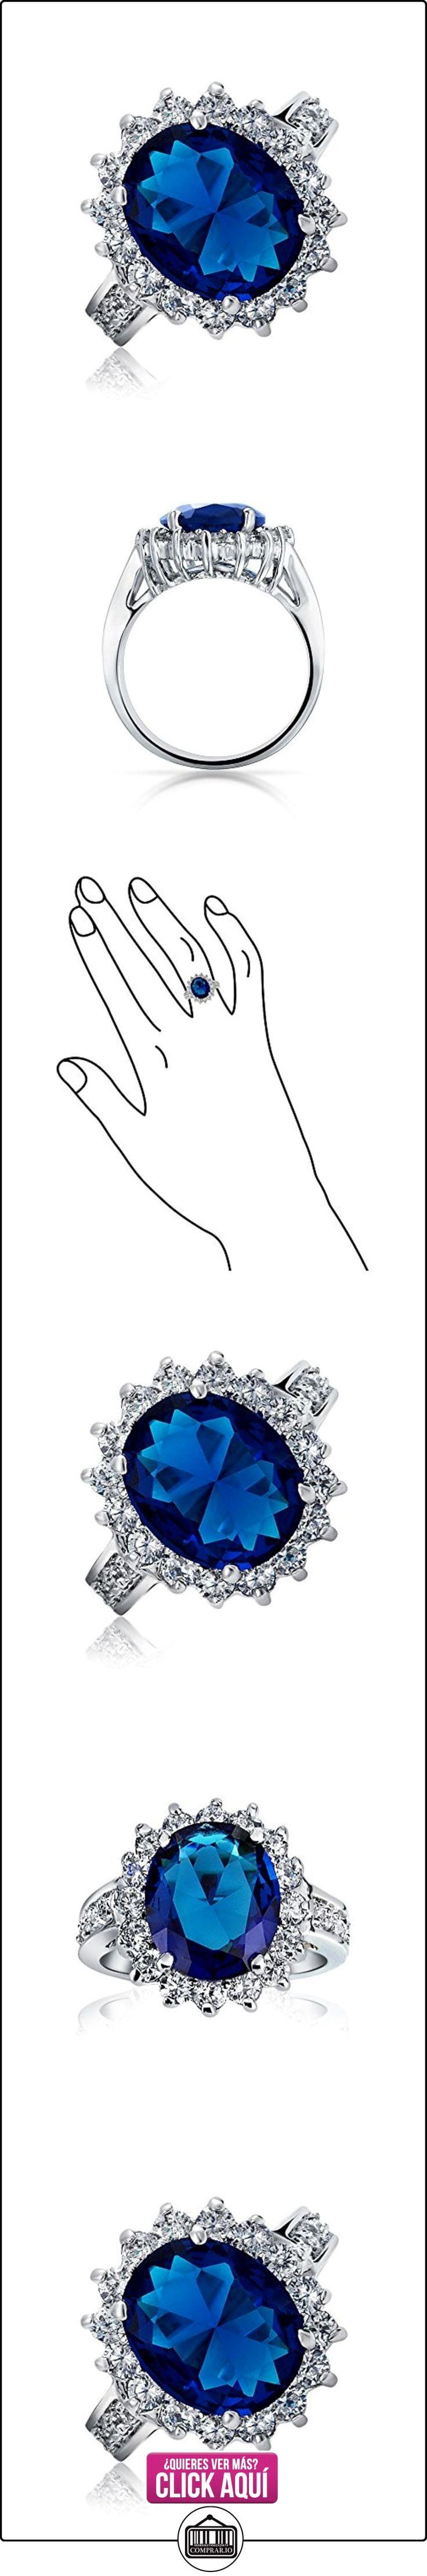 Bling Jewelry estilo Kate Middleton 5ct Oval Color Zafiro CZ Anillo de Compromiso  ✿ Joyas para mujer - Las mejores ofertas ✿ ▬► Ver oferta: https://comprar.io/goto/B01IWQNVRW